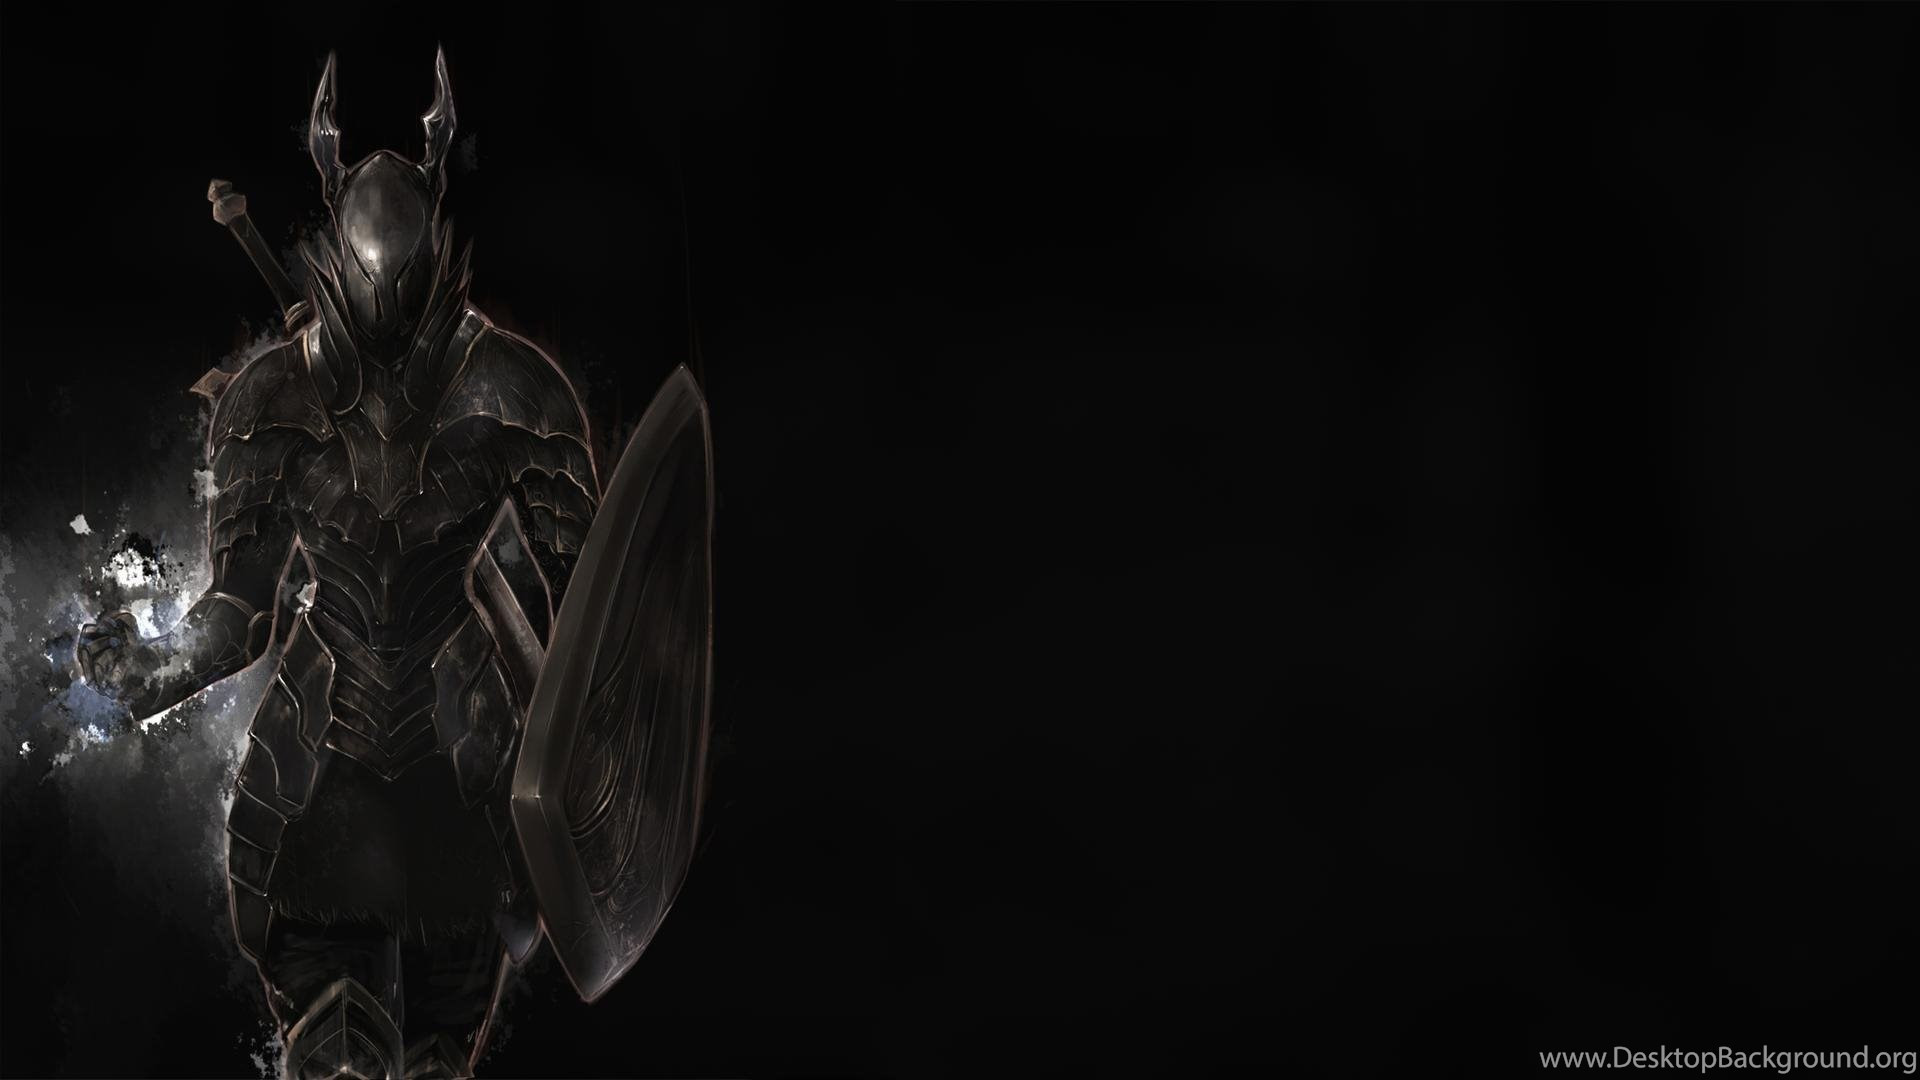 Download Wallpaper Dark Theme Hd Cikimm Com